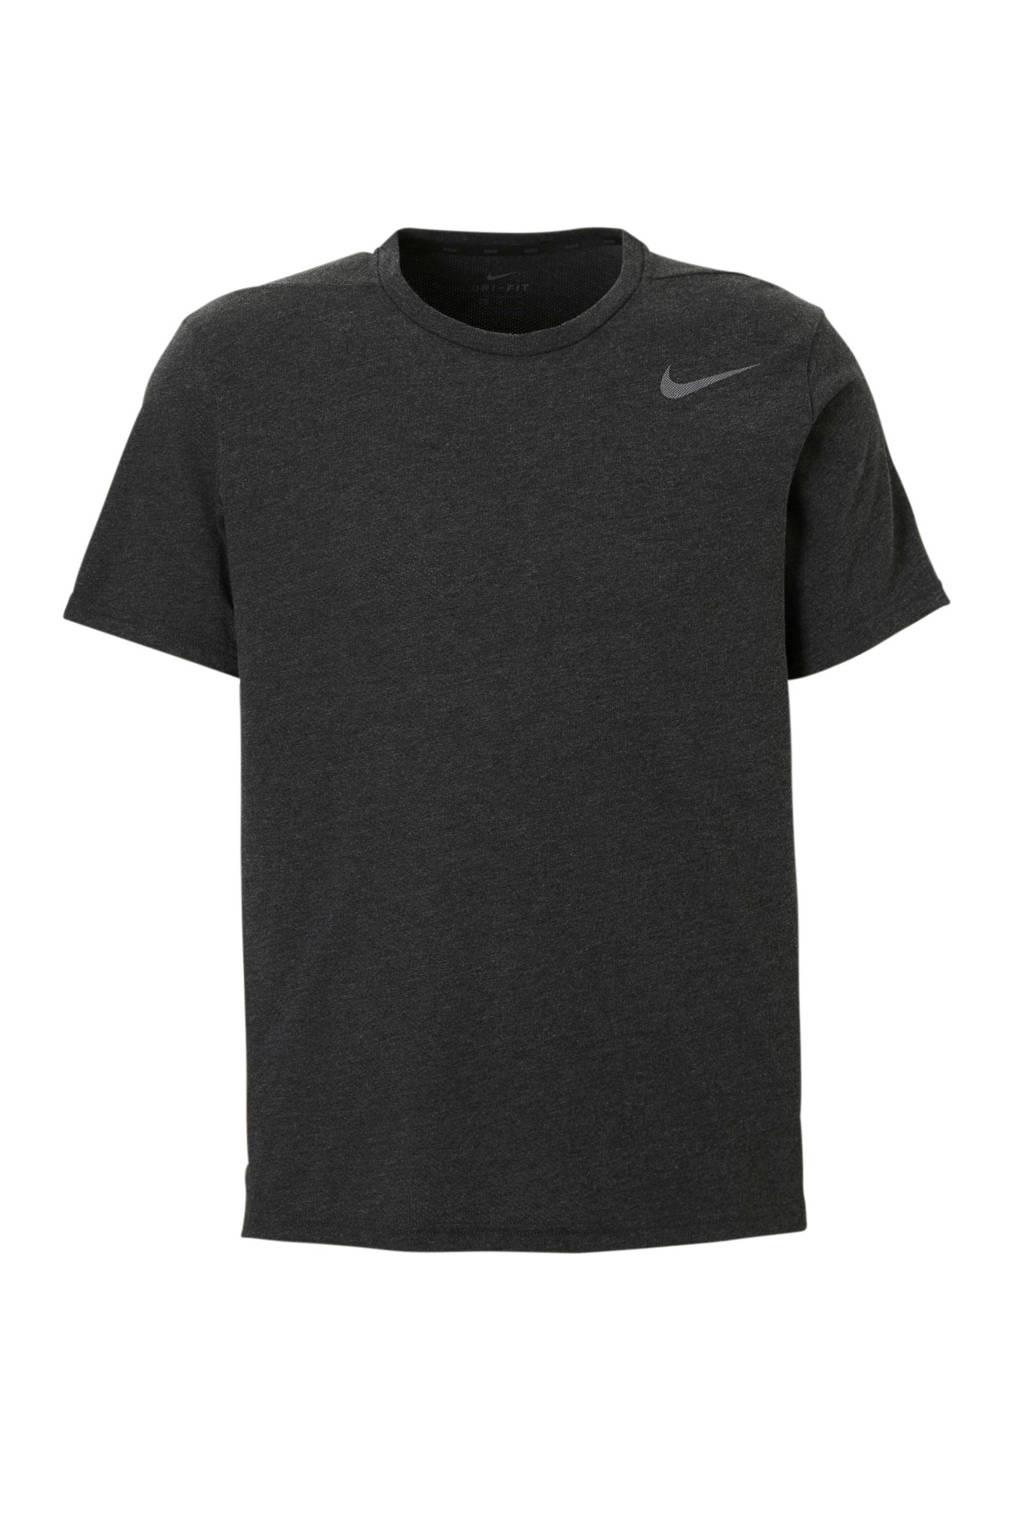 Nike   sport T-shirt antraciet, Antraciet